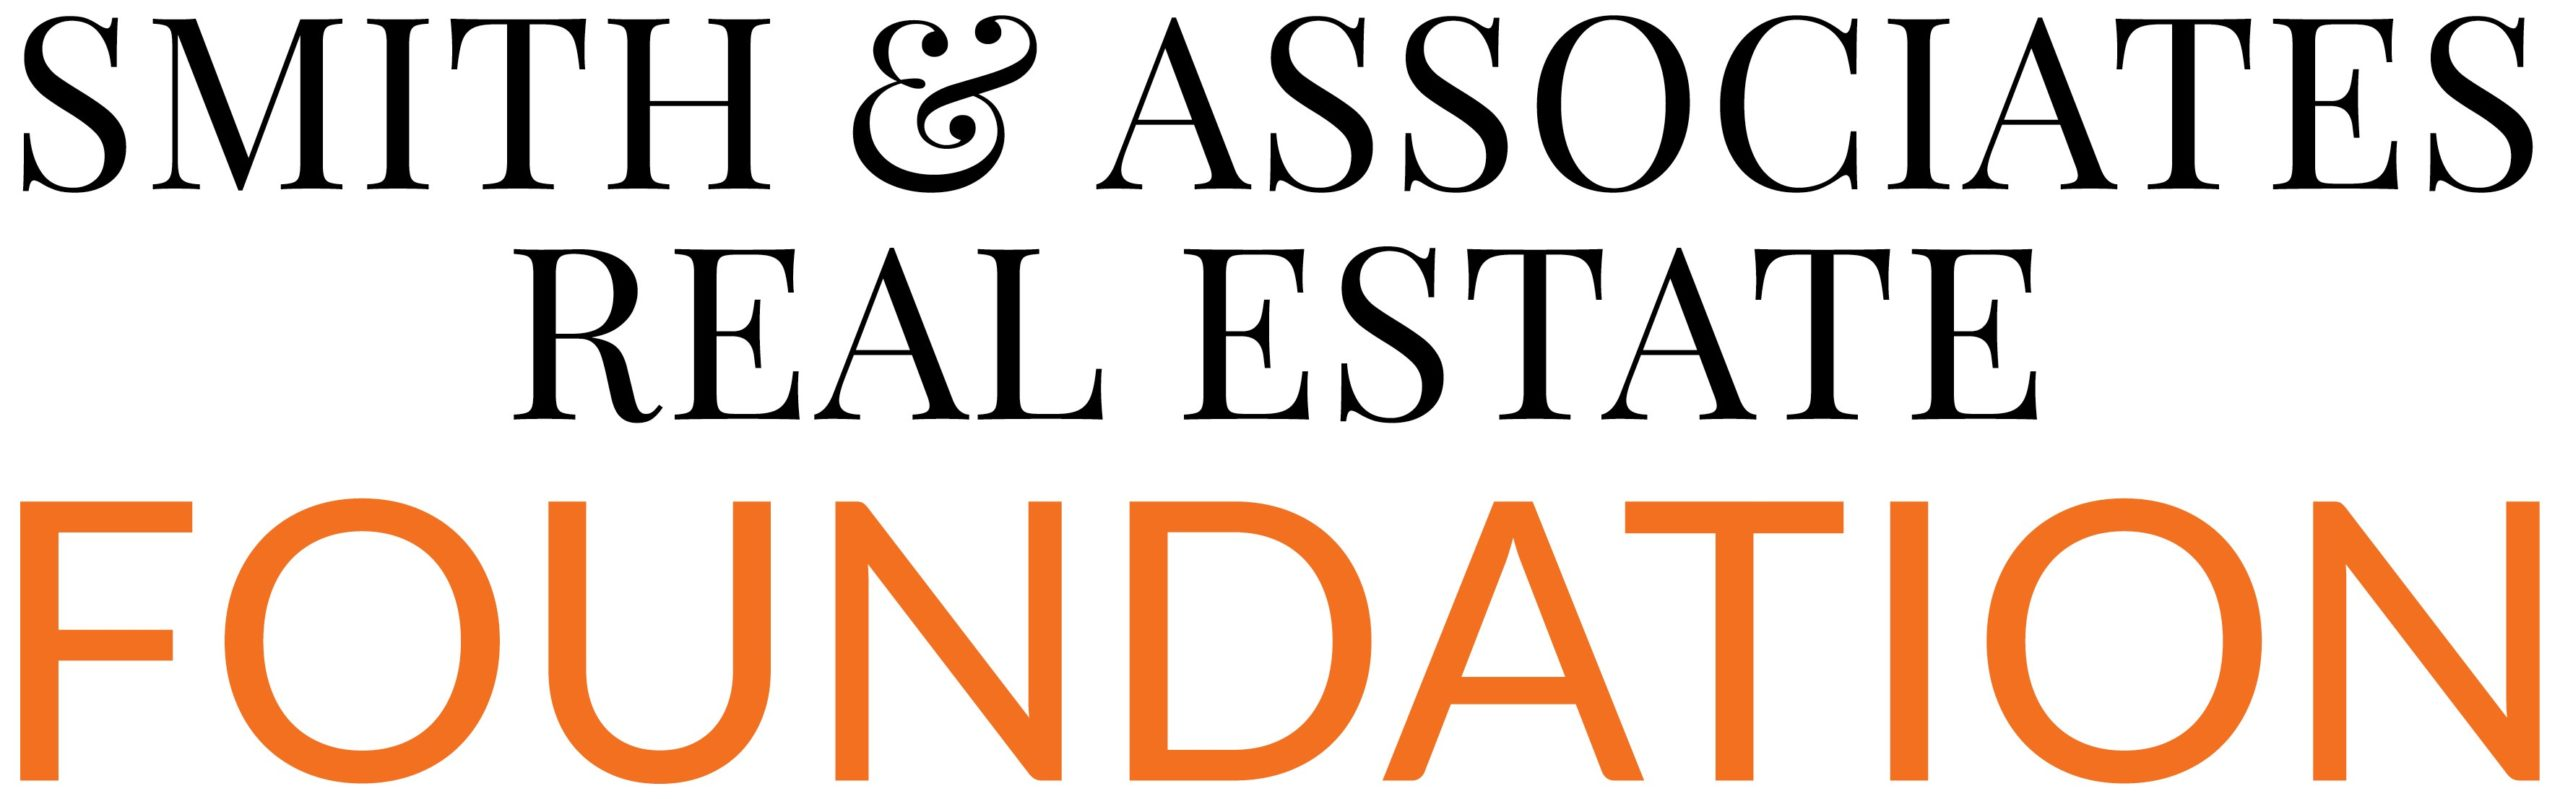 Smith & Associates Real Estate Foundation